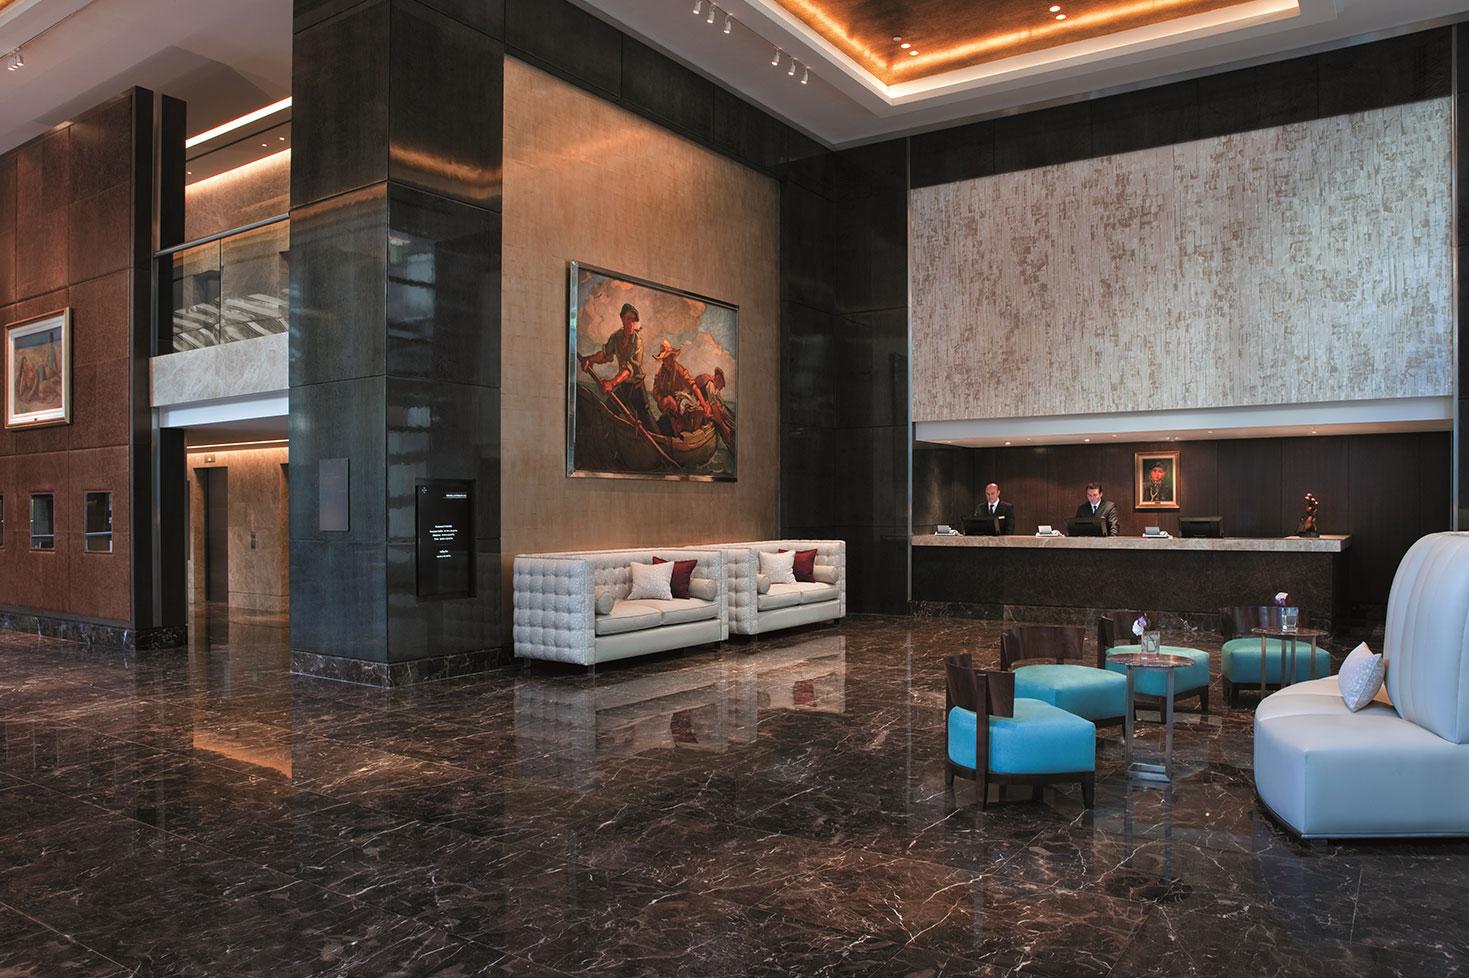 alvear art hotel buenos aires 2018 world s best hotels rh palisadehotelyubacity com